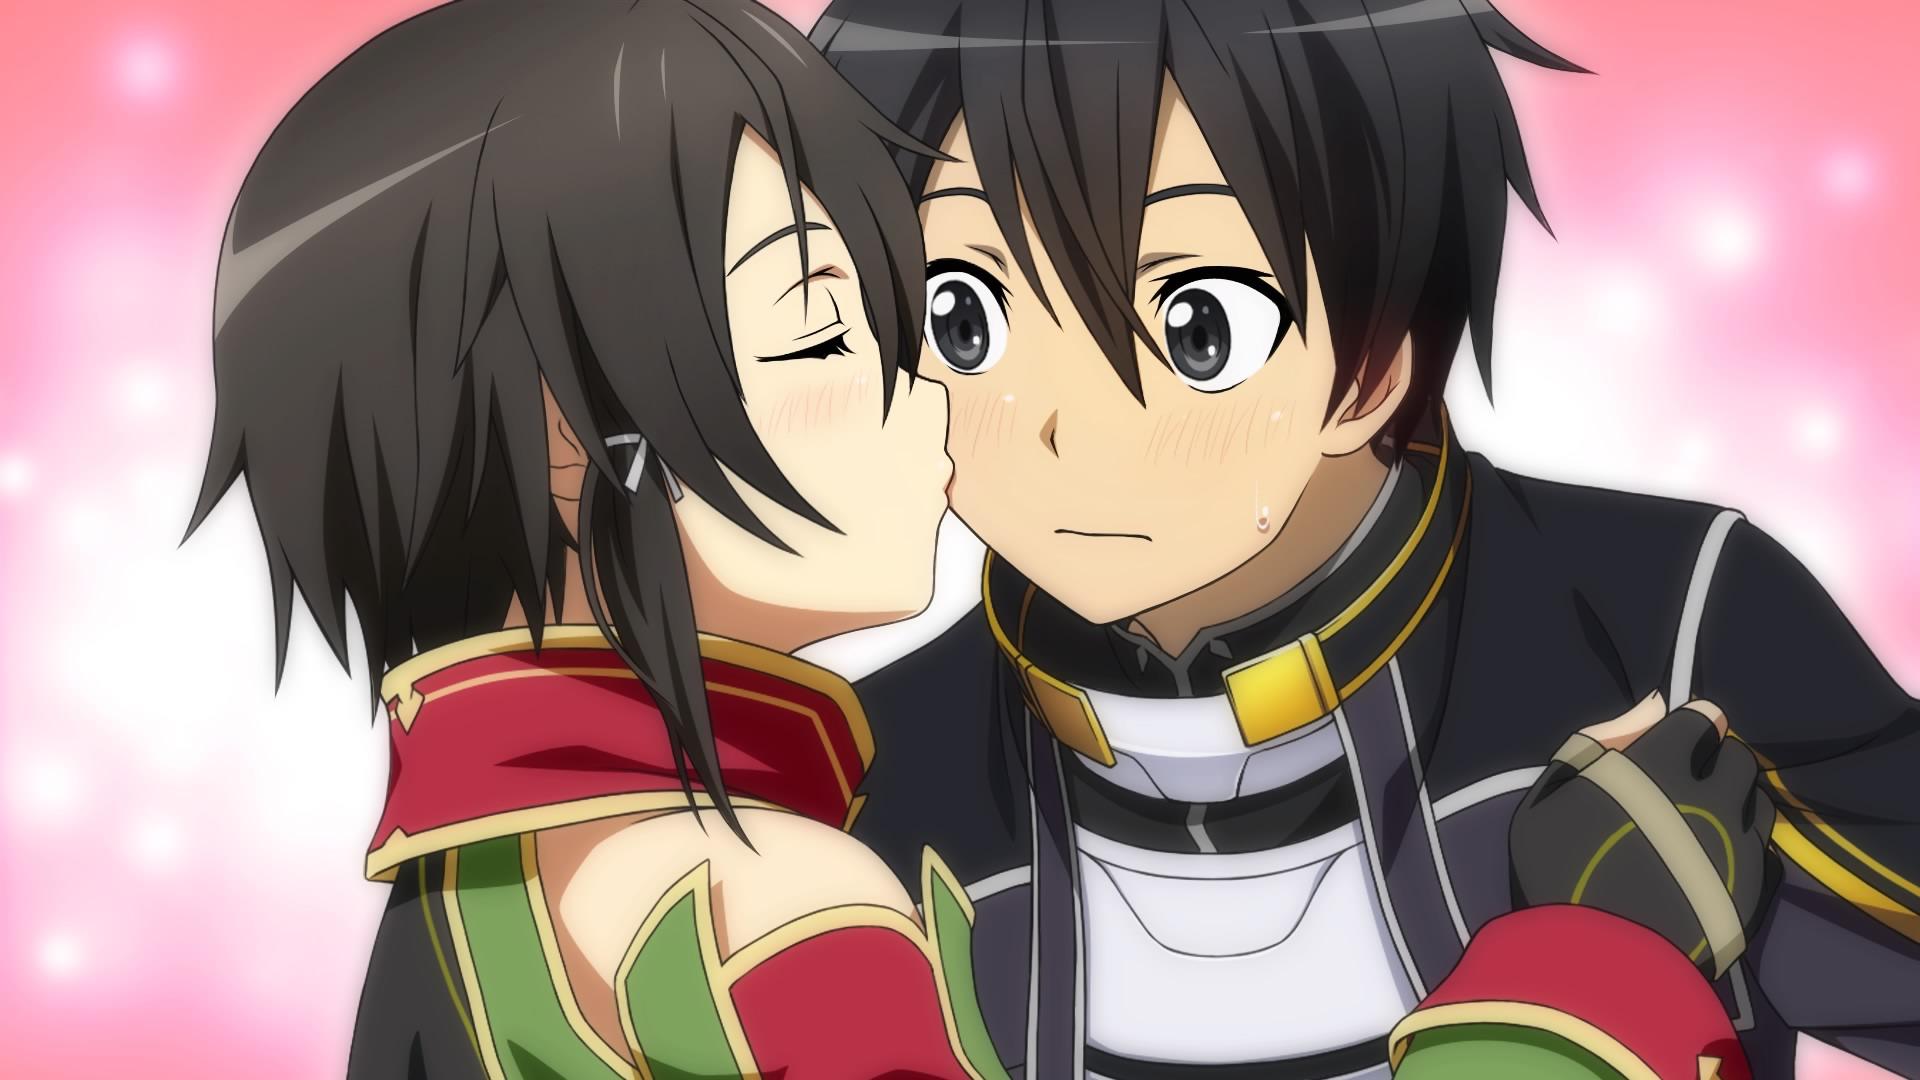 Sinon Kissing Kirito On His Cheek